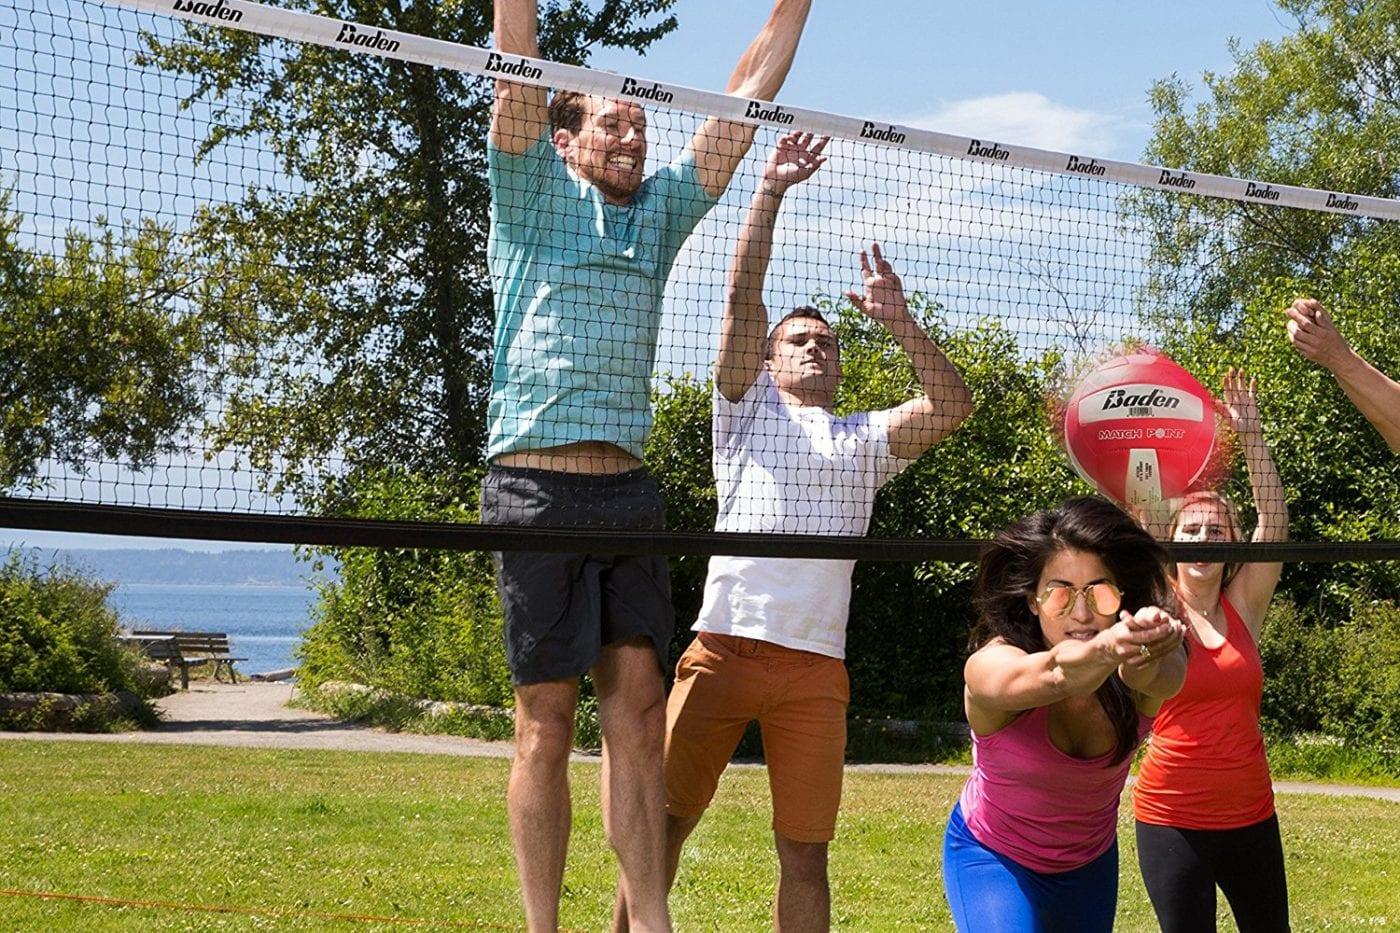 Baden Champions Volleyball/badminton Set